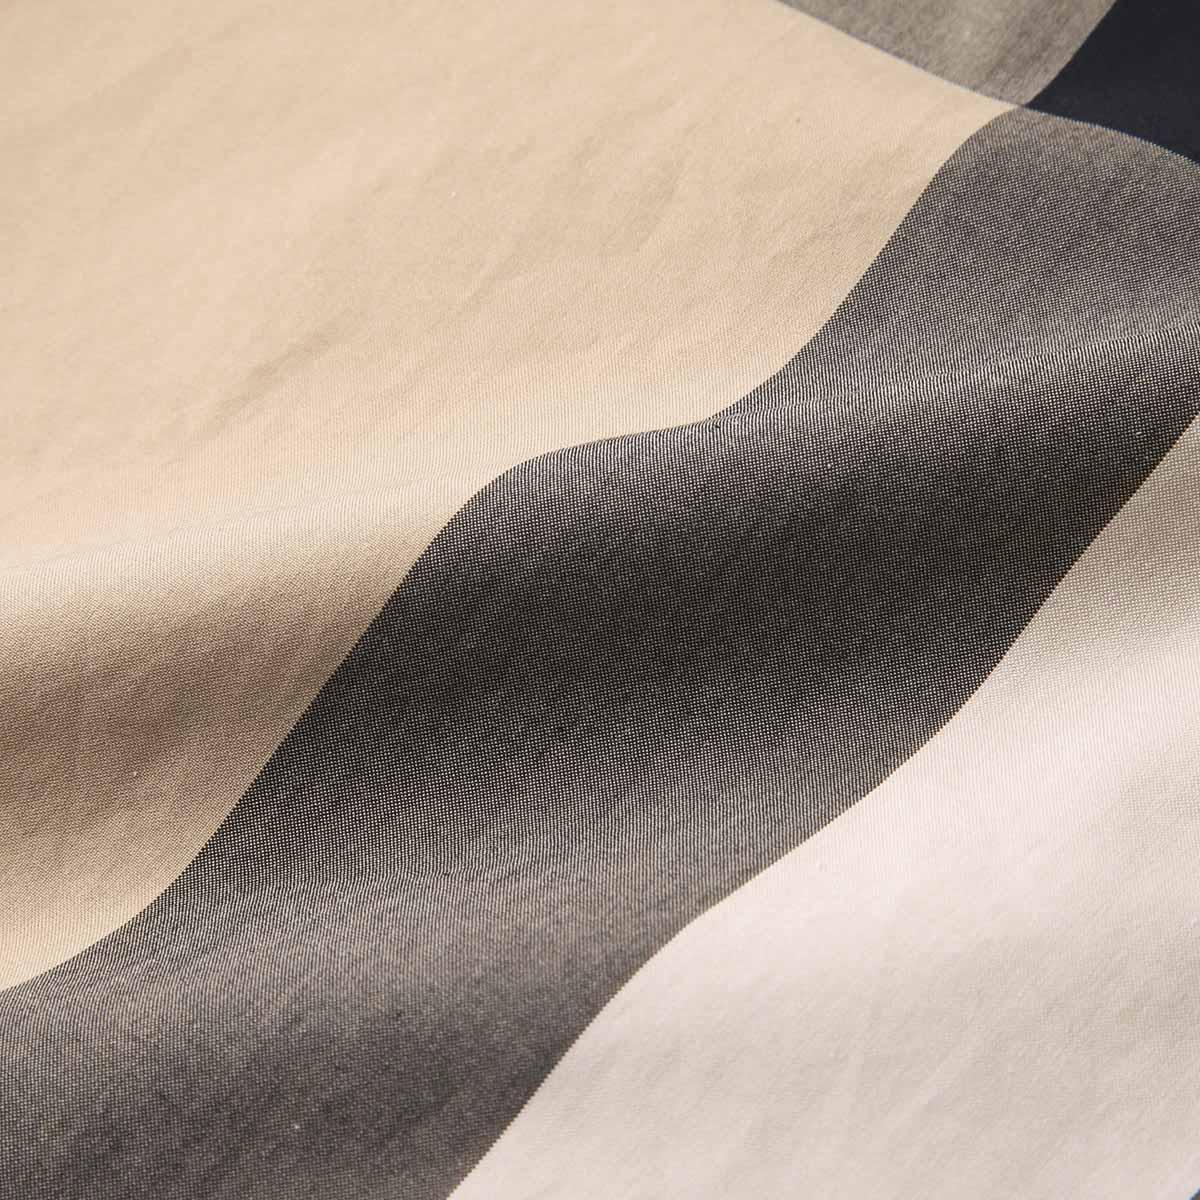 BURBERRY バーバリー  半袖シャツ/SHORTSLEEVE CHECK COTTON SHIRT メンズ